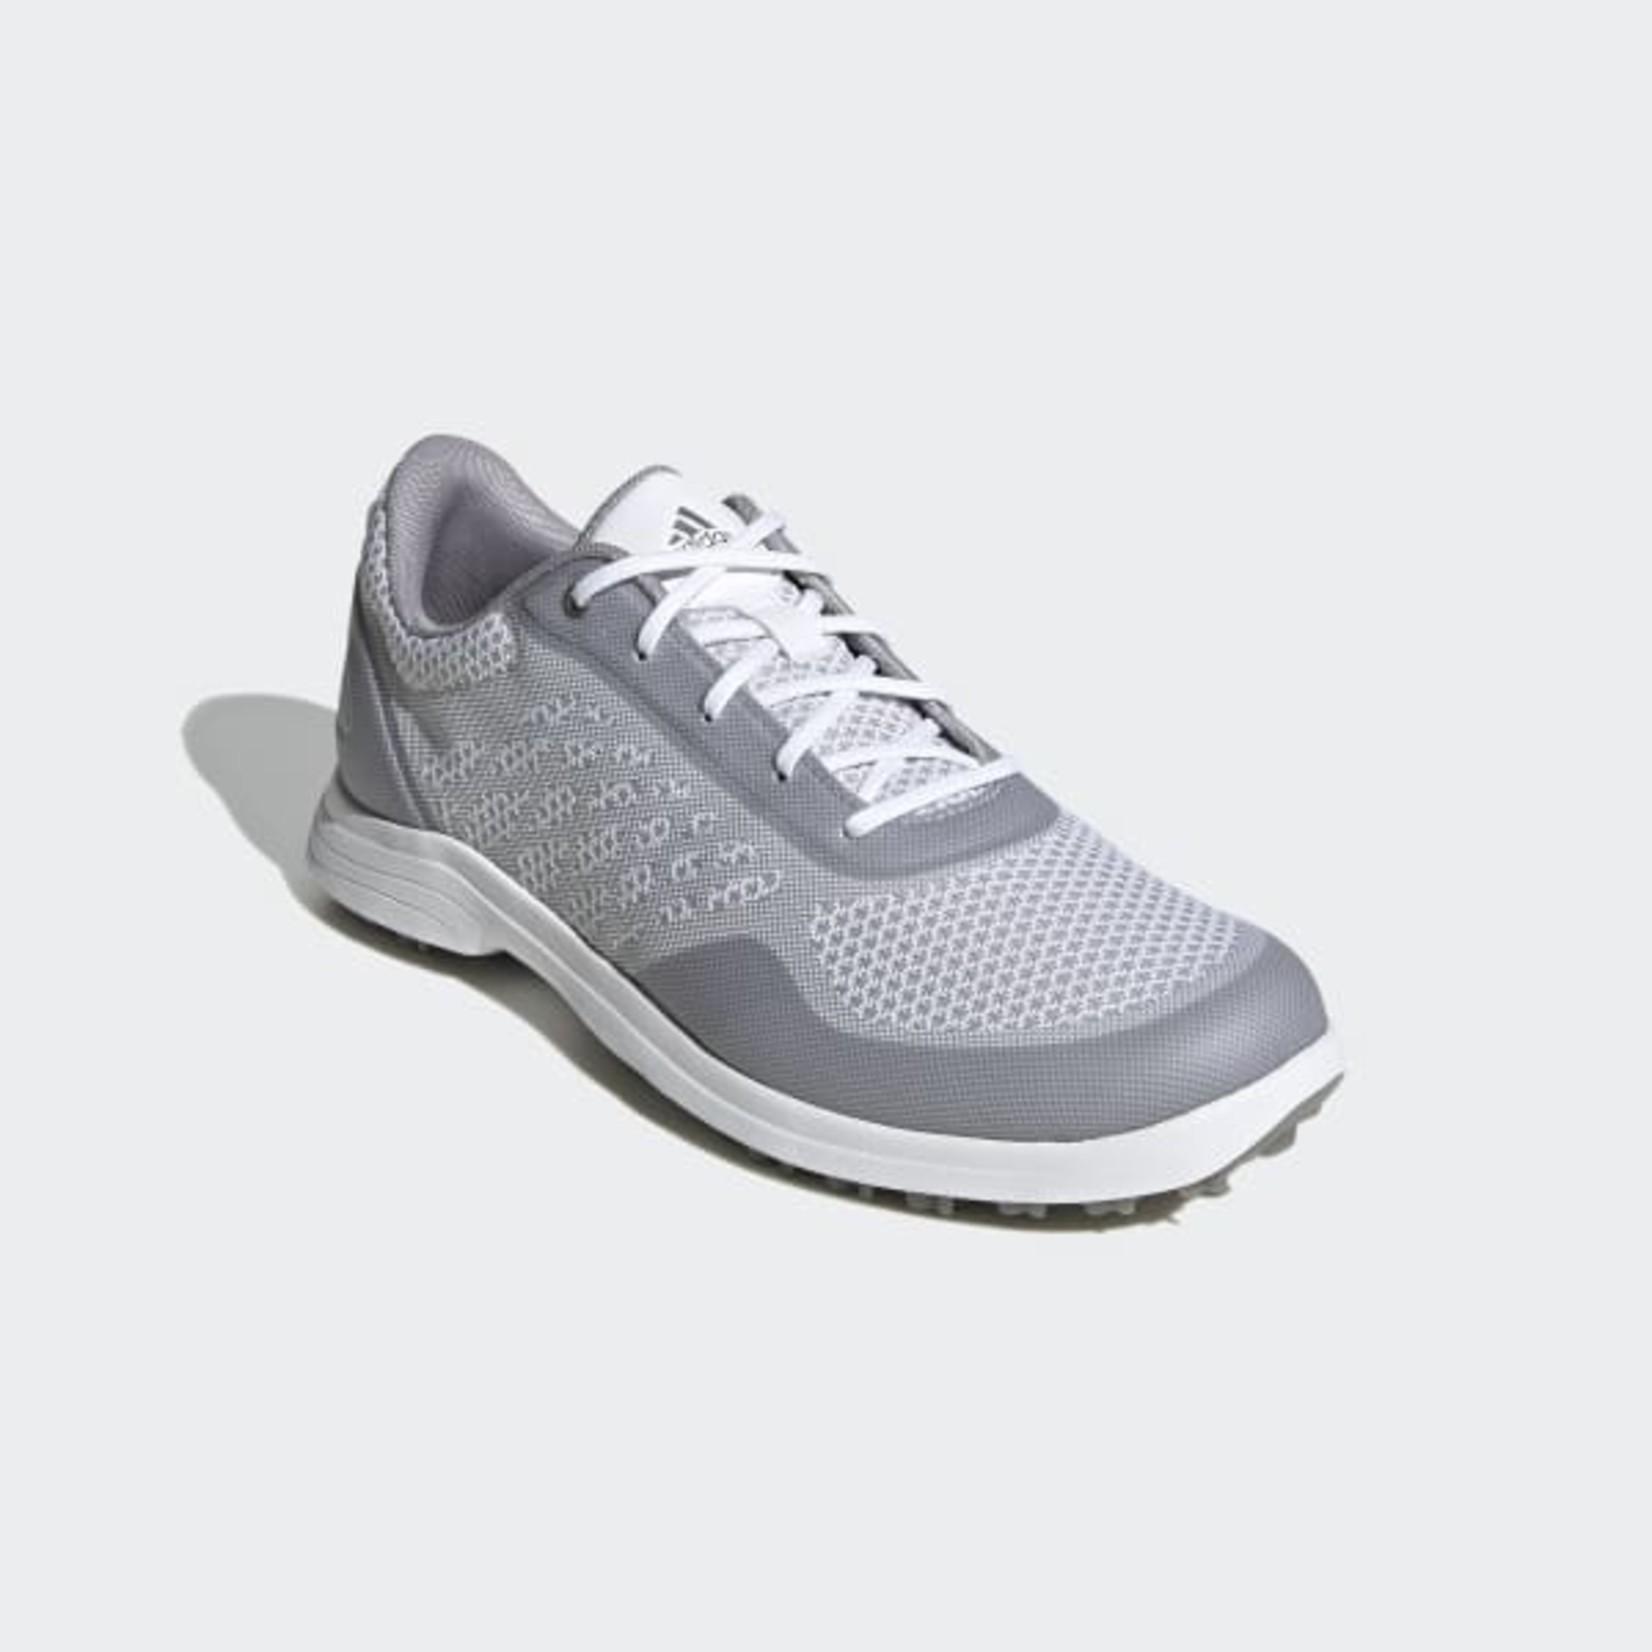 Adidas Adidas W Alphaflex Sport White/Grey UK 6 1/2 / EUR 40